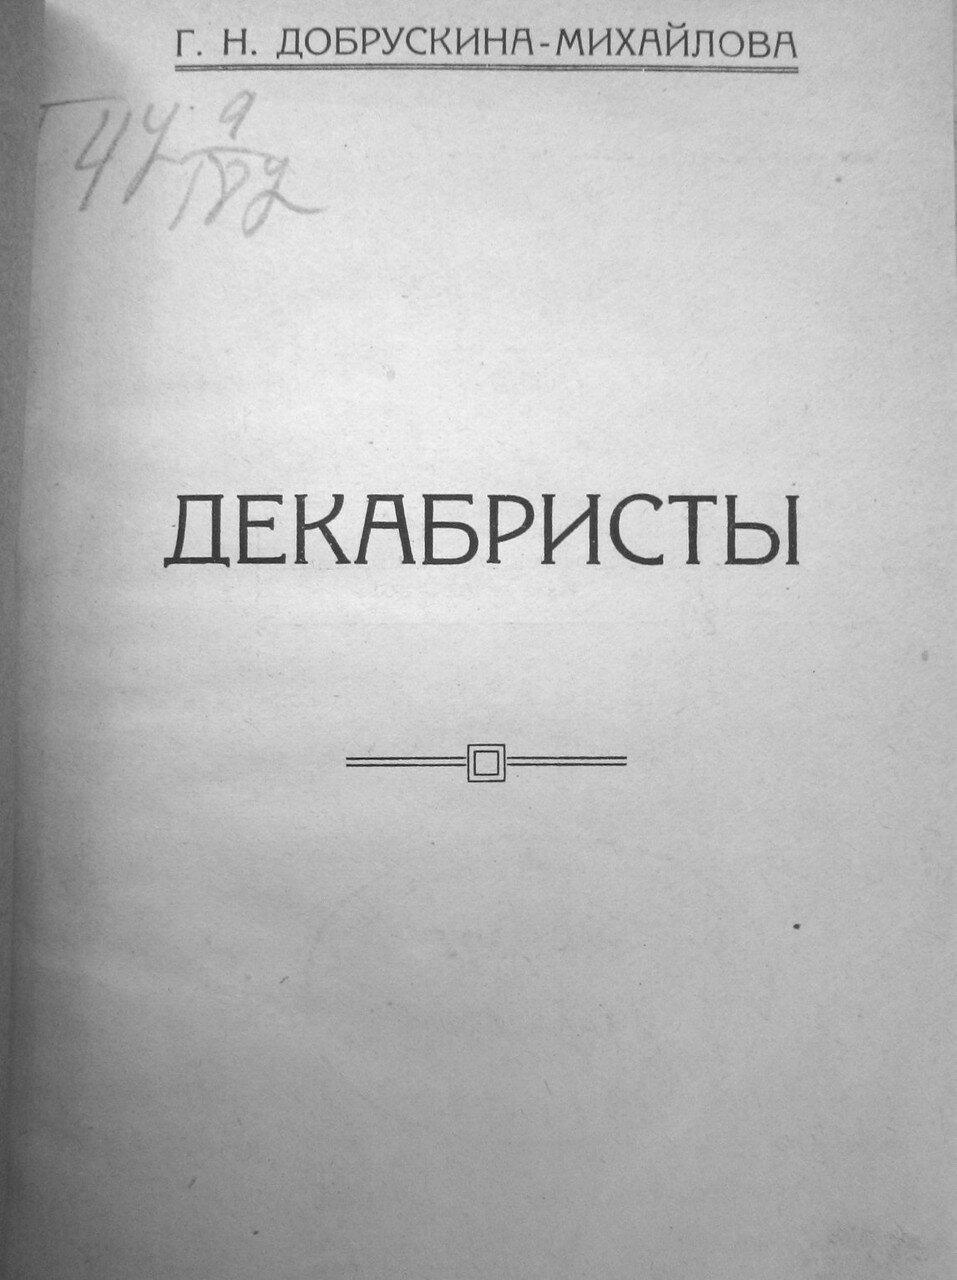 https://img-fotki.yandex.ru/get/60682/199368979.23/0_1bfac6_778e2d76_XXXL.jpg